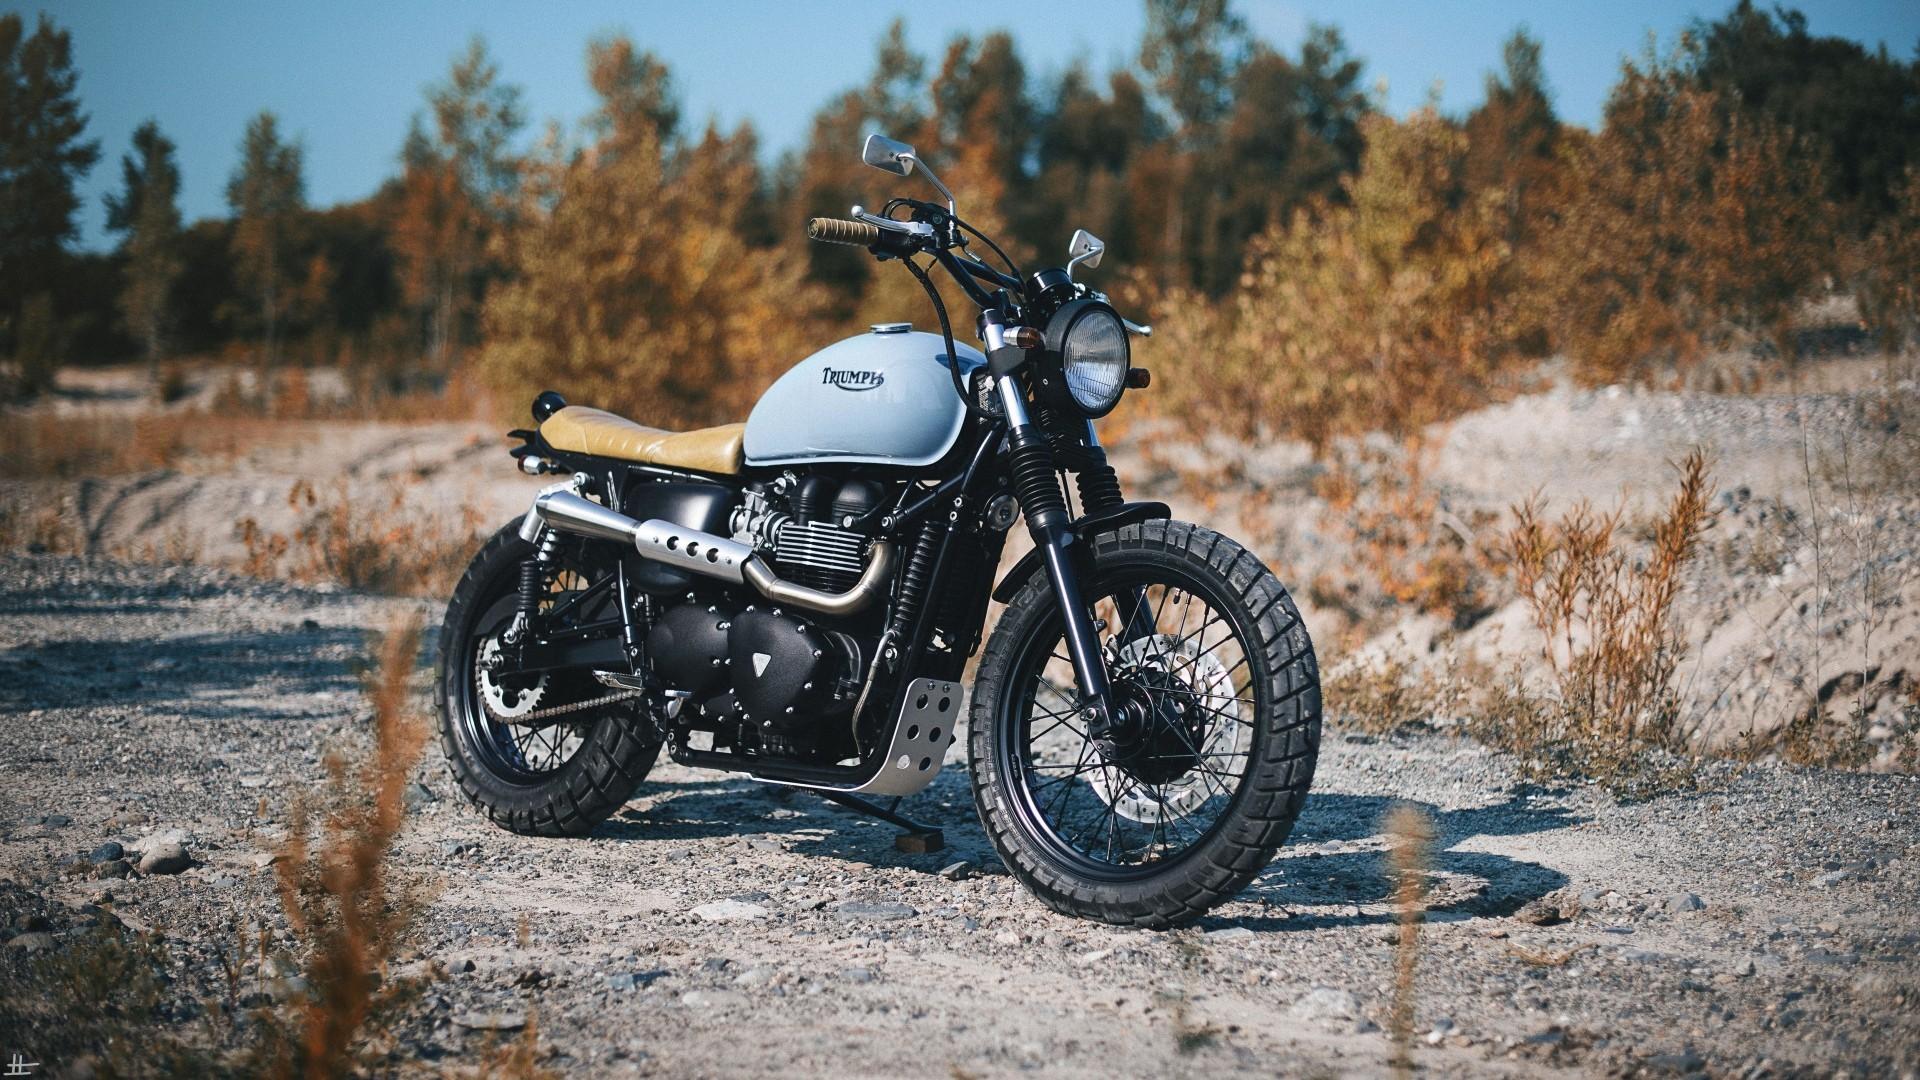 Blue Modified Bike Hd Wallpaper: Bobber Motorcycle Wallpaper (62+ Images